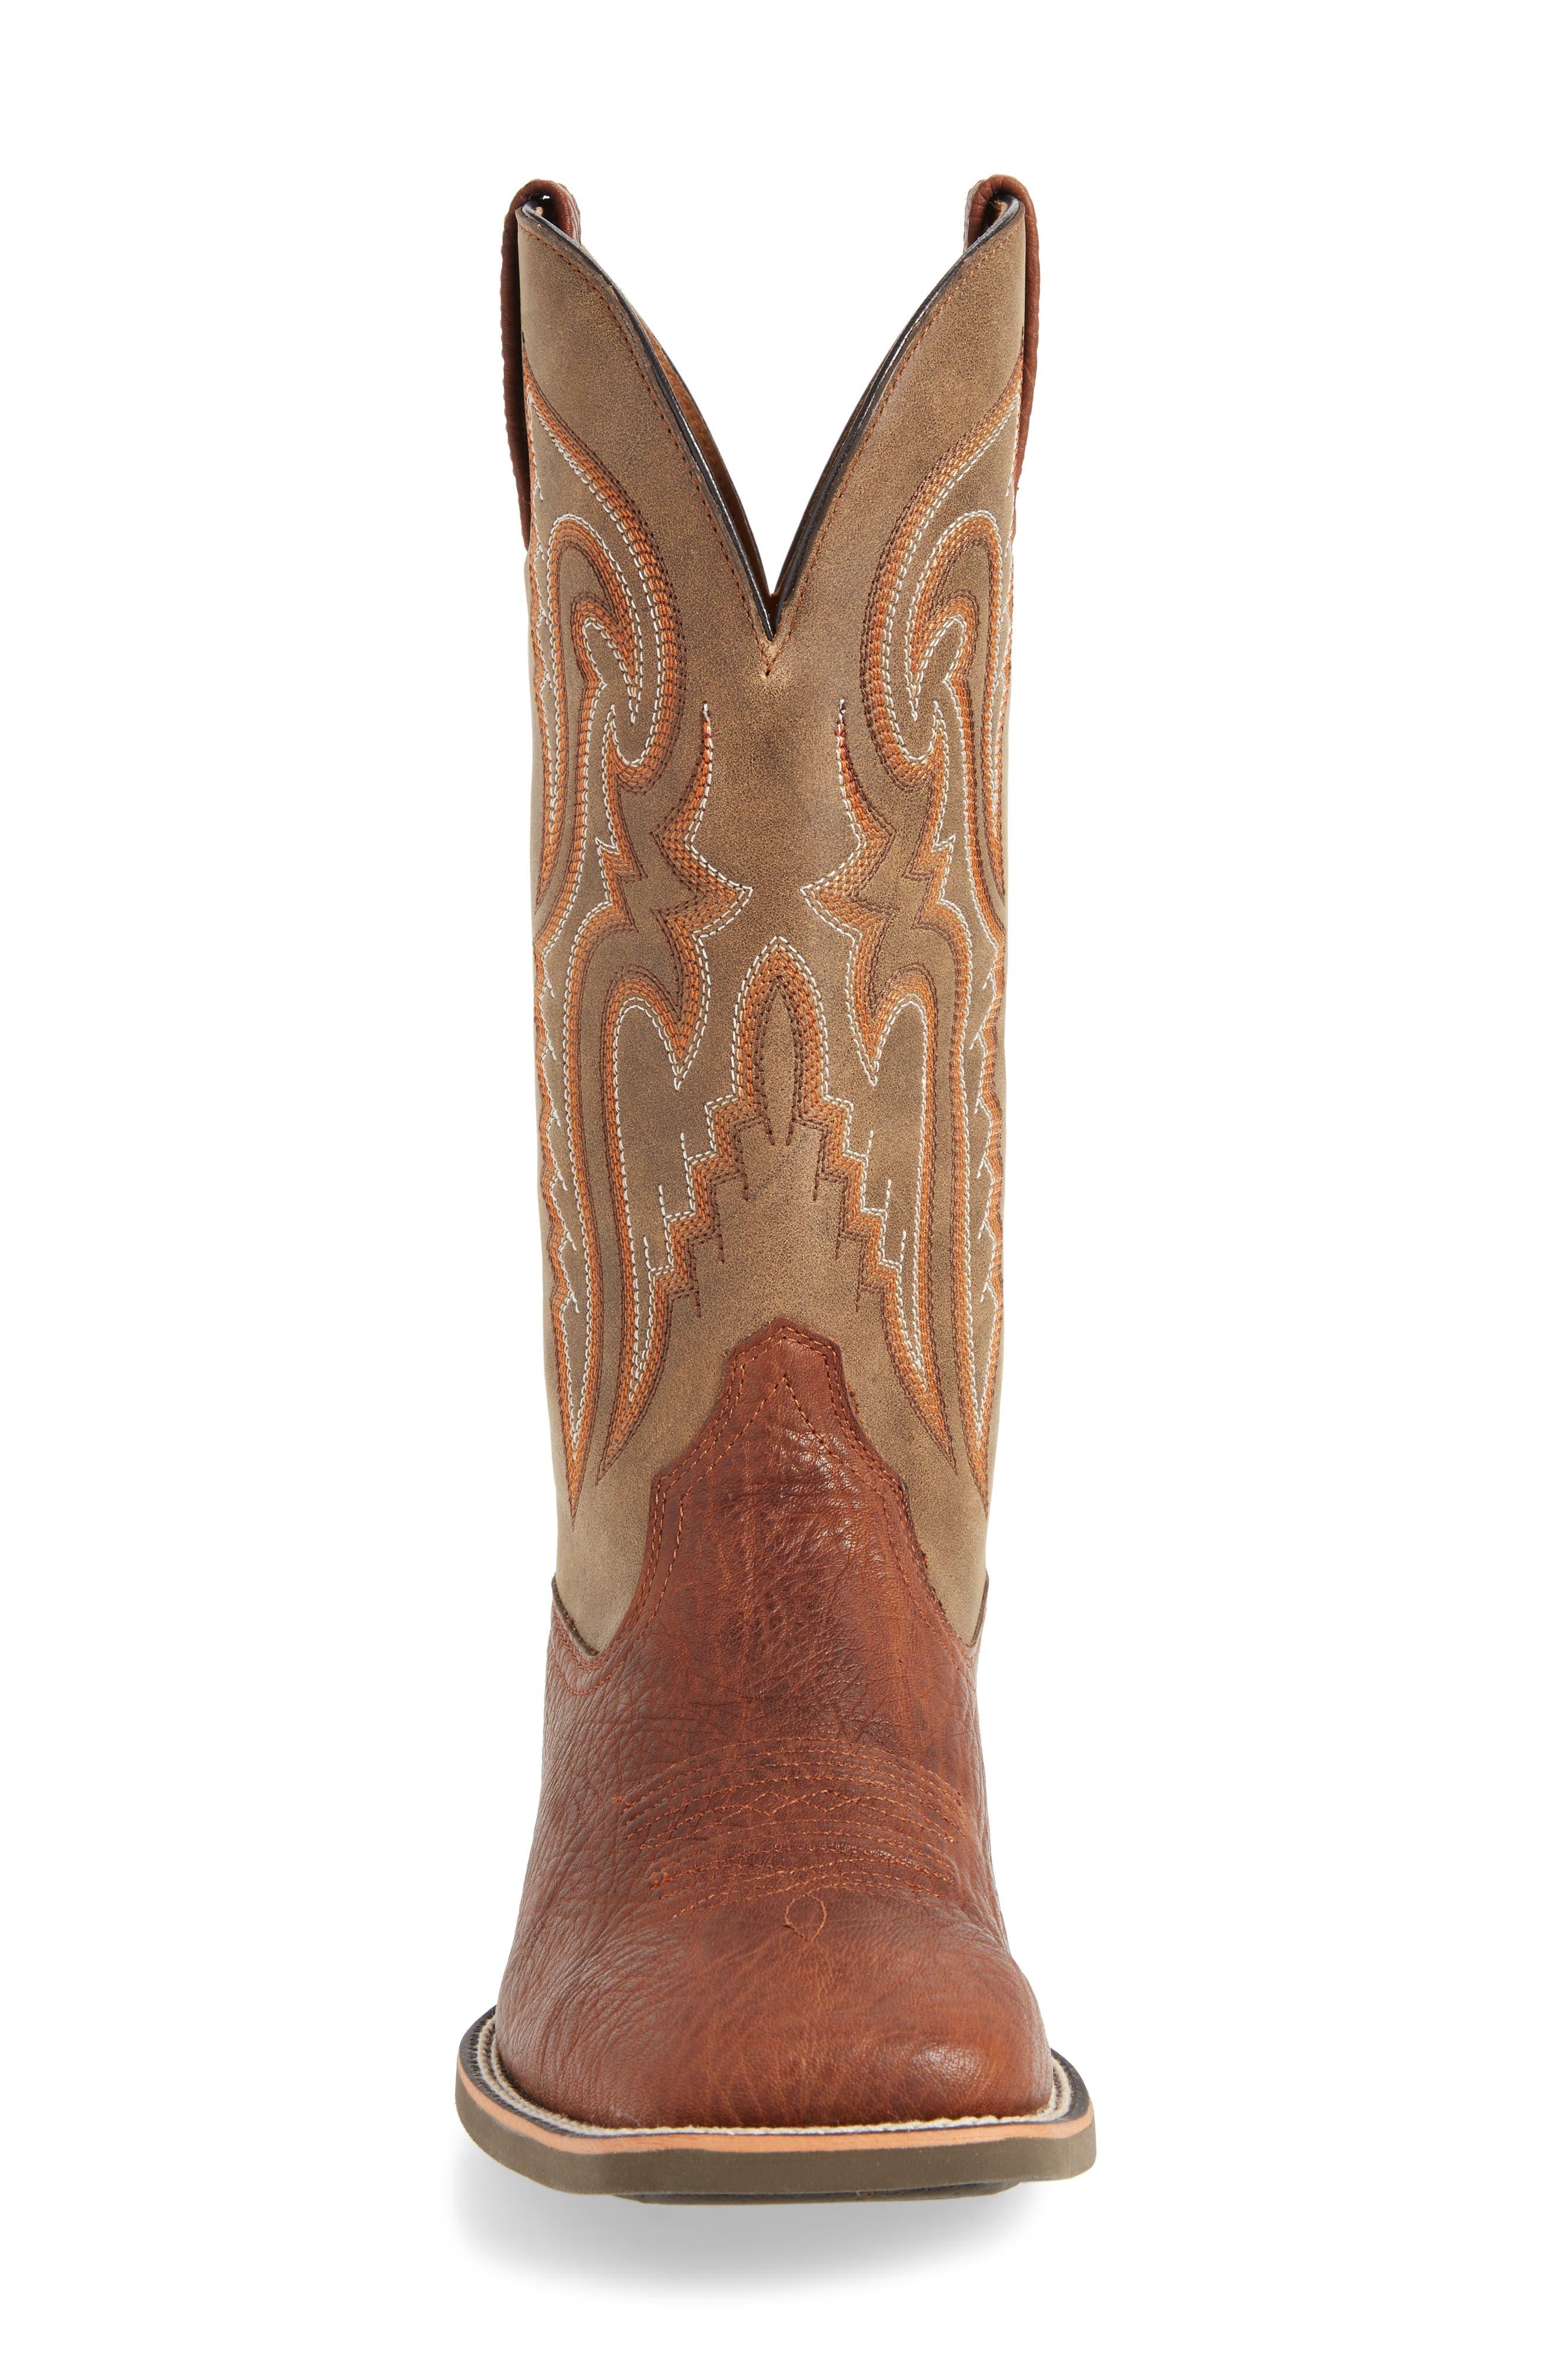 Heritage Latigo Square Toe Cowboy Boot,                             Alternate thumbnail 4, color,                             COGNAC/ BROWN BOMBER LEATHER